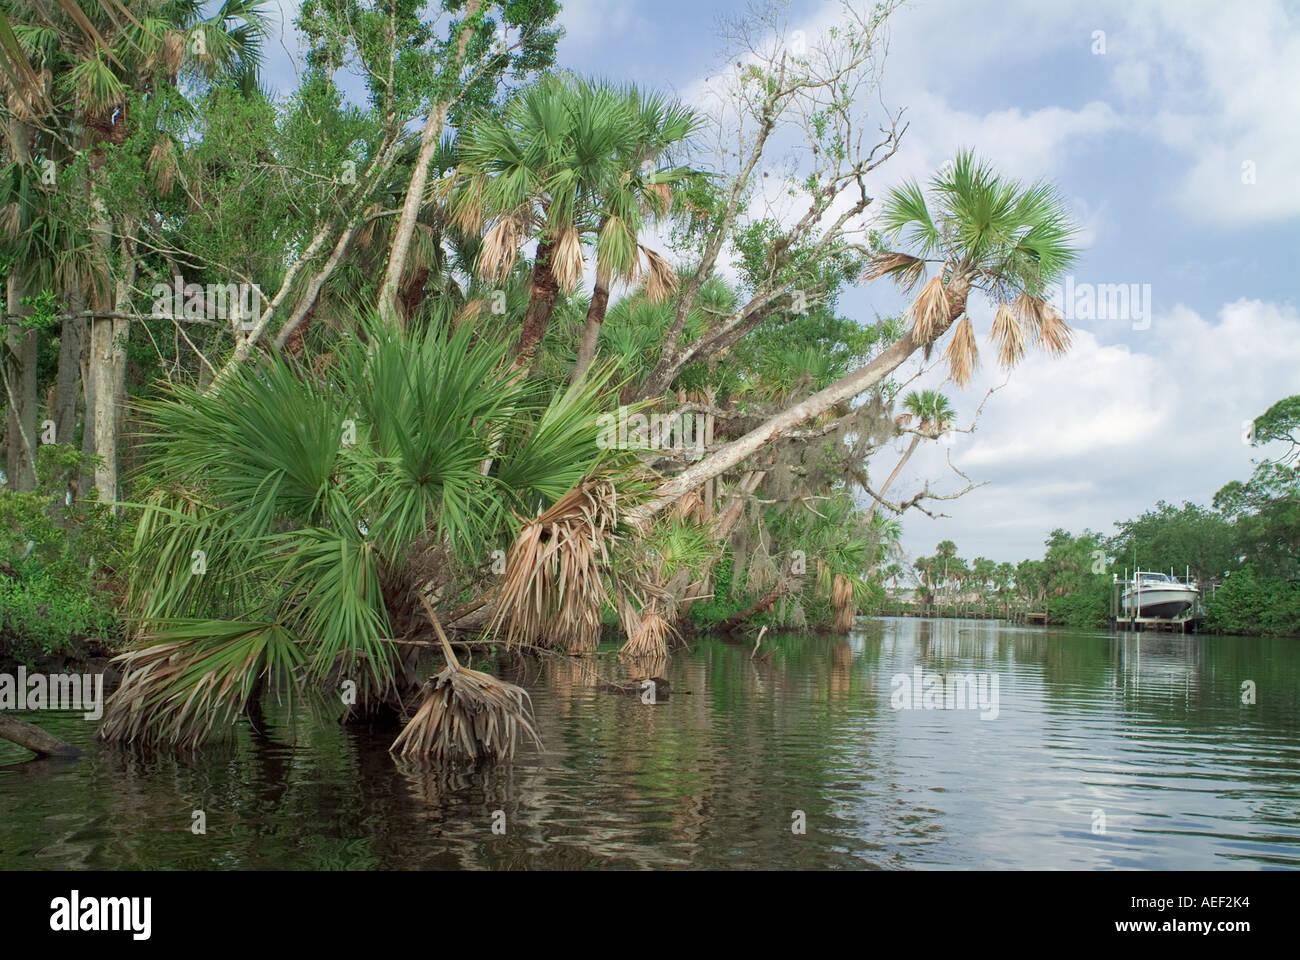 Landscapes along the south bank - South Fork Saint Lucie River Palm Trees Along River Bank Stuart Martin County Fl Tropical